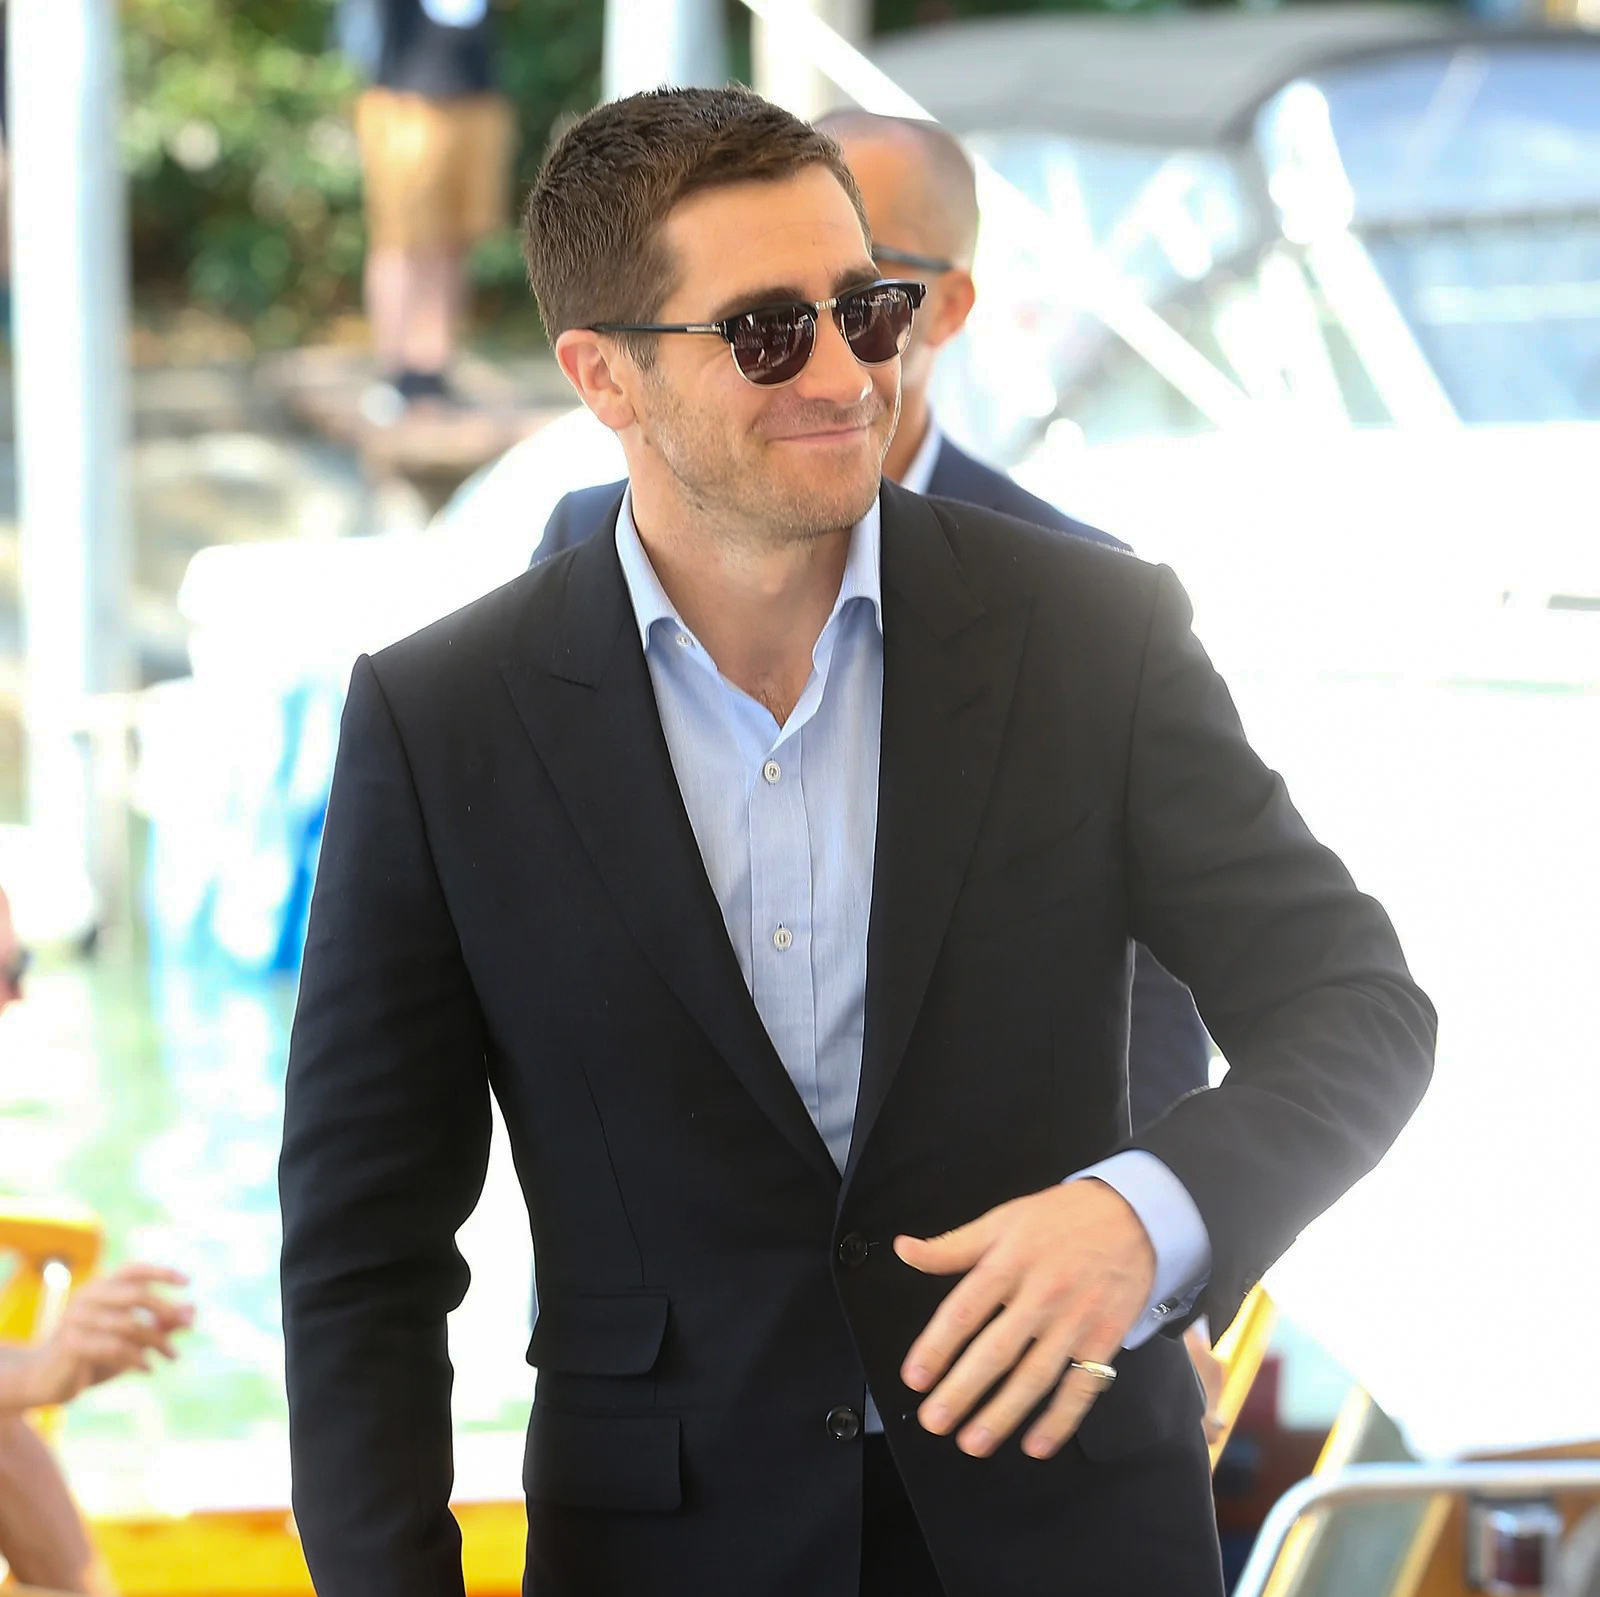 jake gyllenhaal matches semi-rimless sunglasses